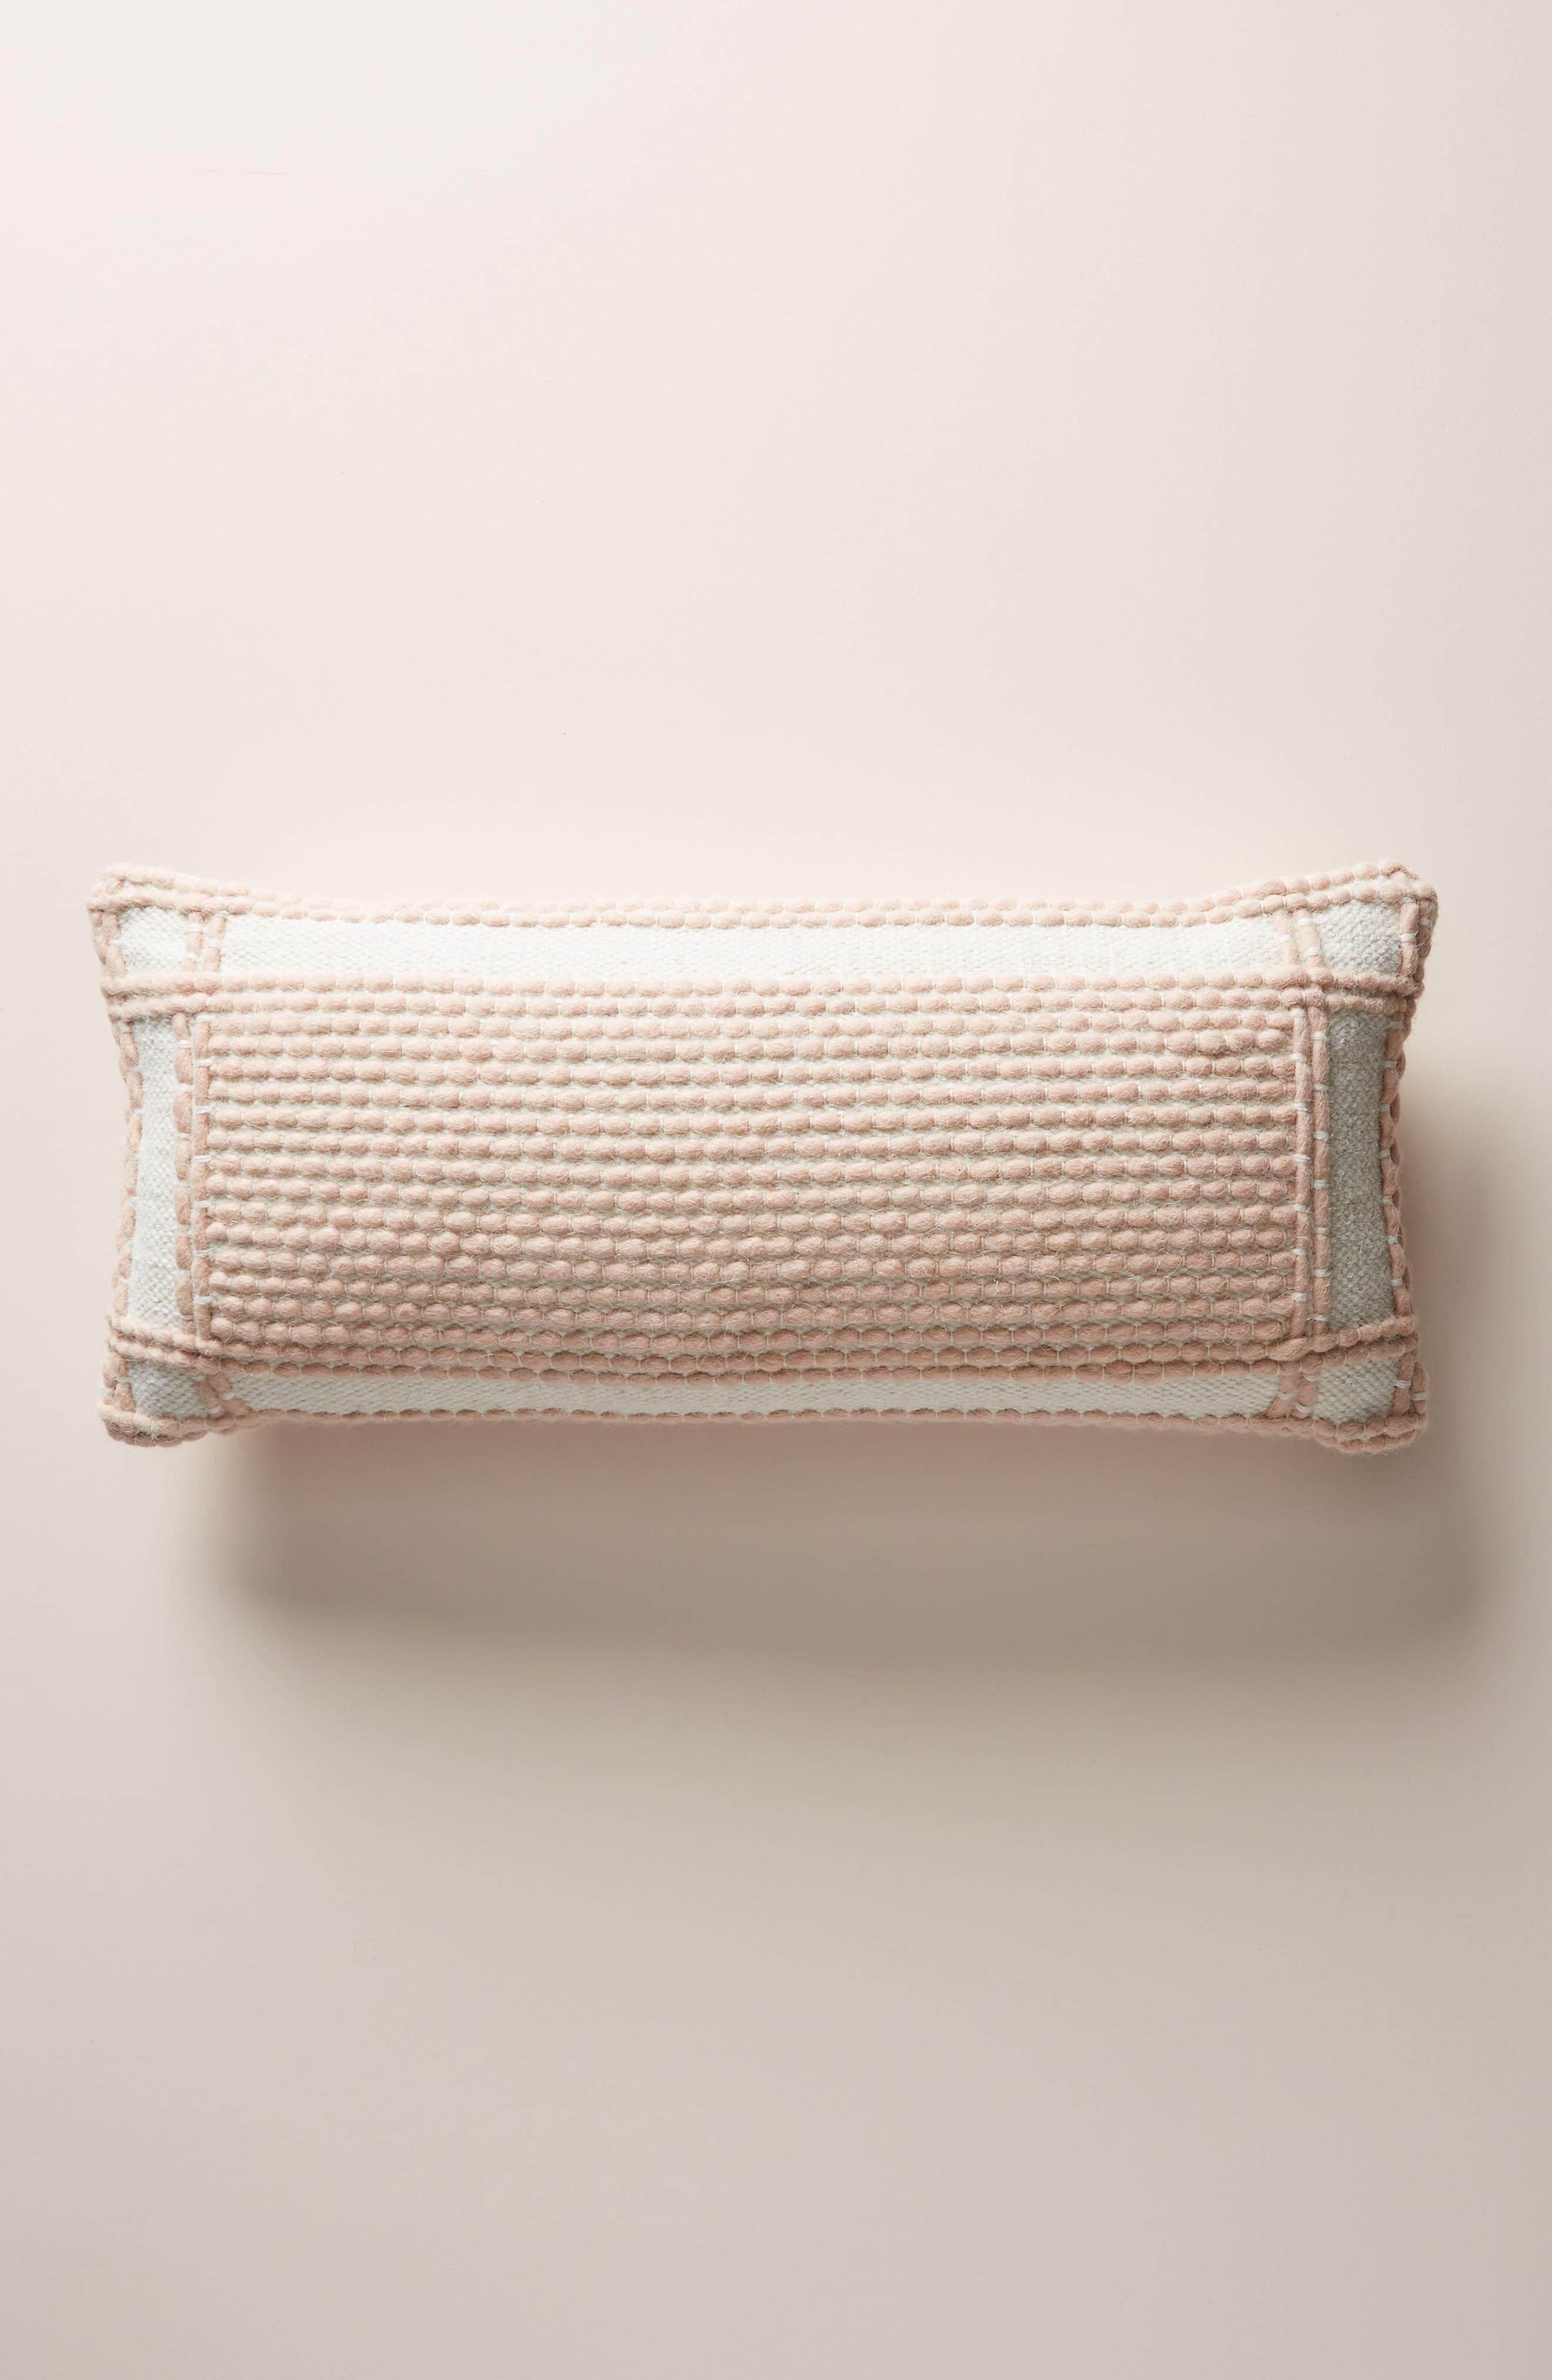 ANTHROPOLOGIE, Evie Bauble Accent Pillow, Main thumbnail 1, color, BLUSH